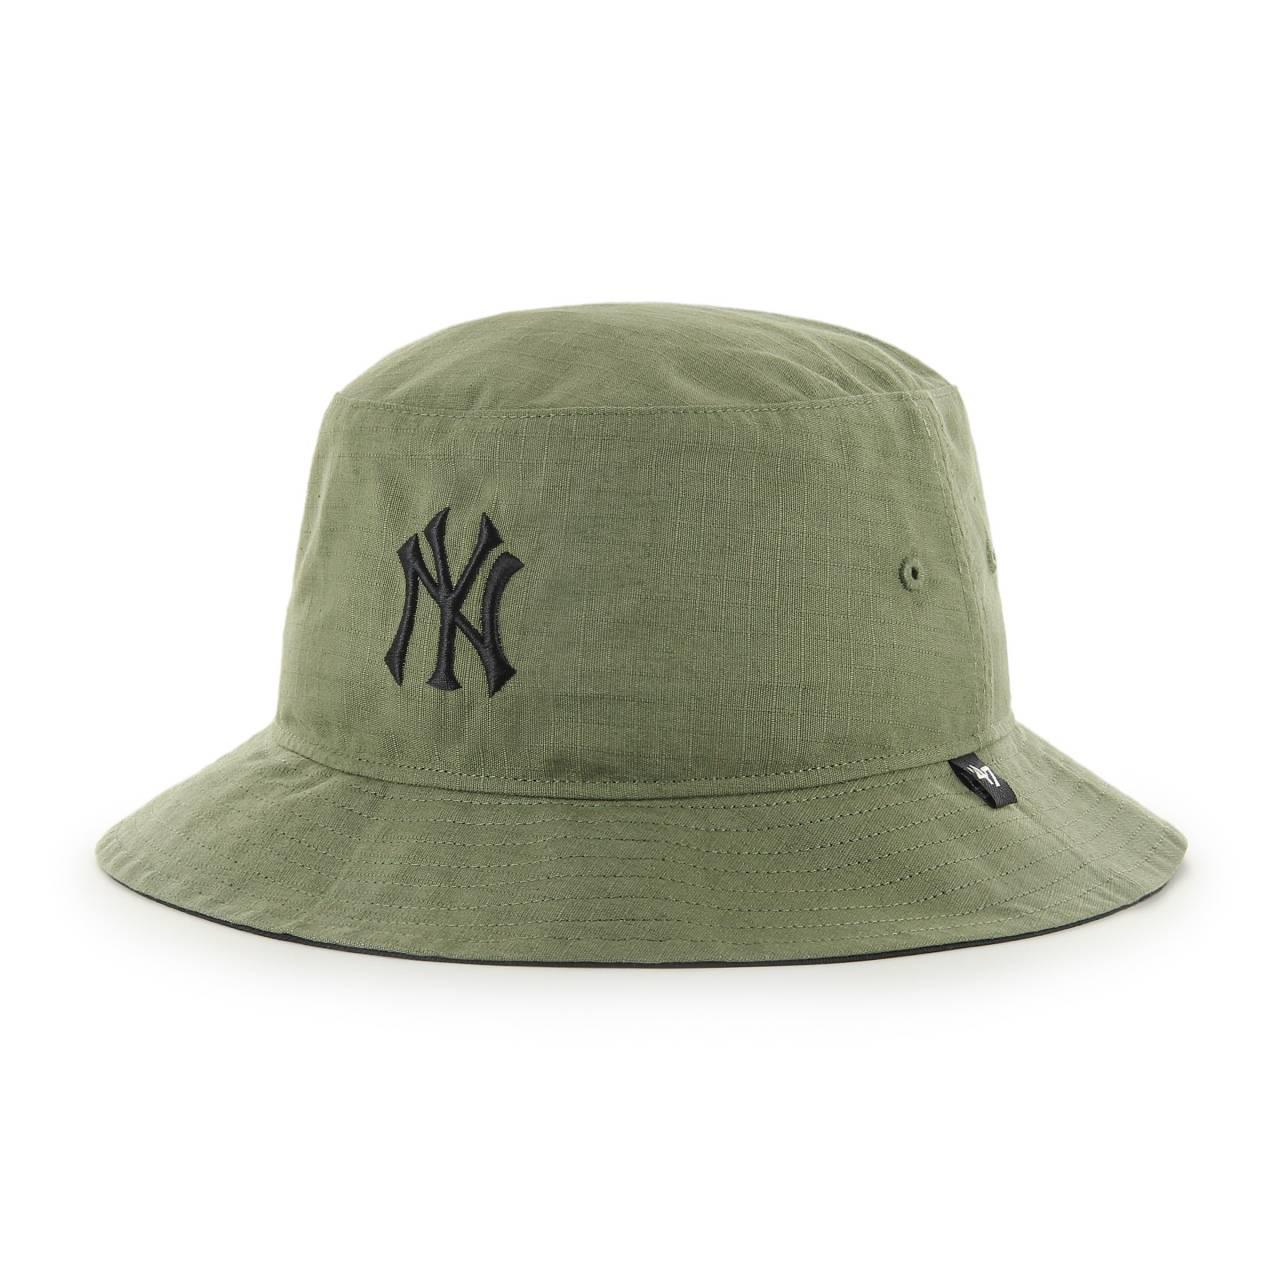 MLB NEW YORK YANKEES GRID LOCK '47 BUCKET